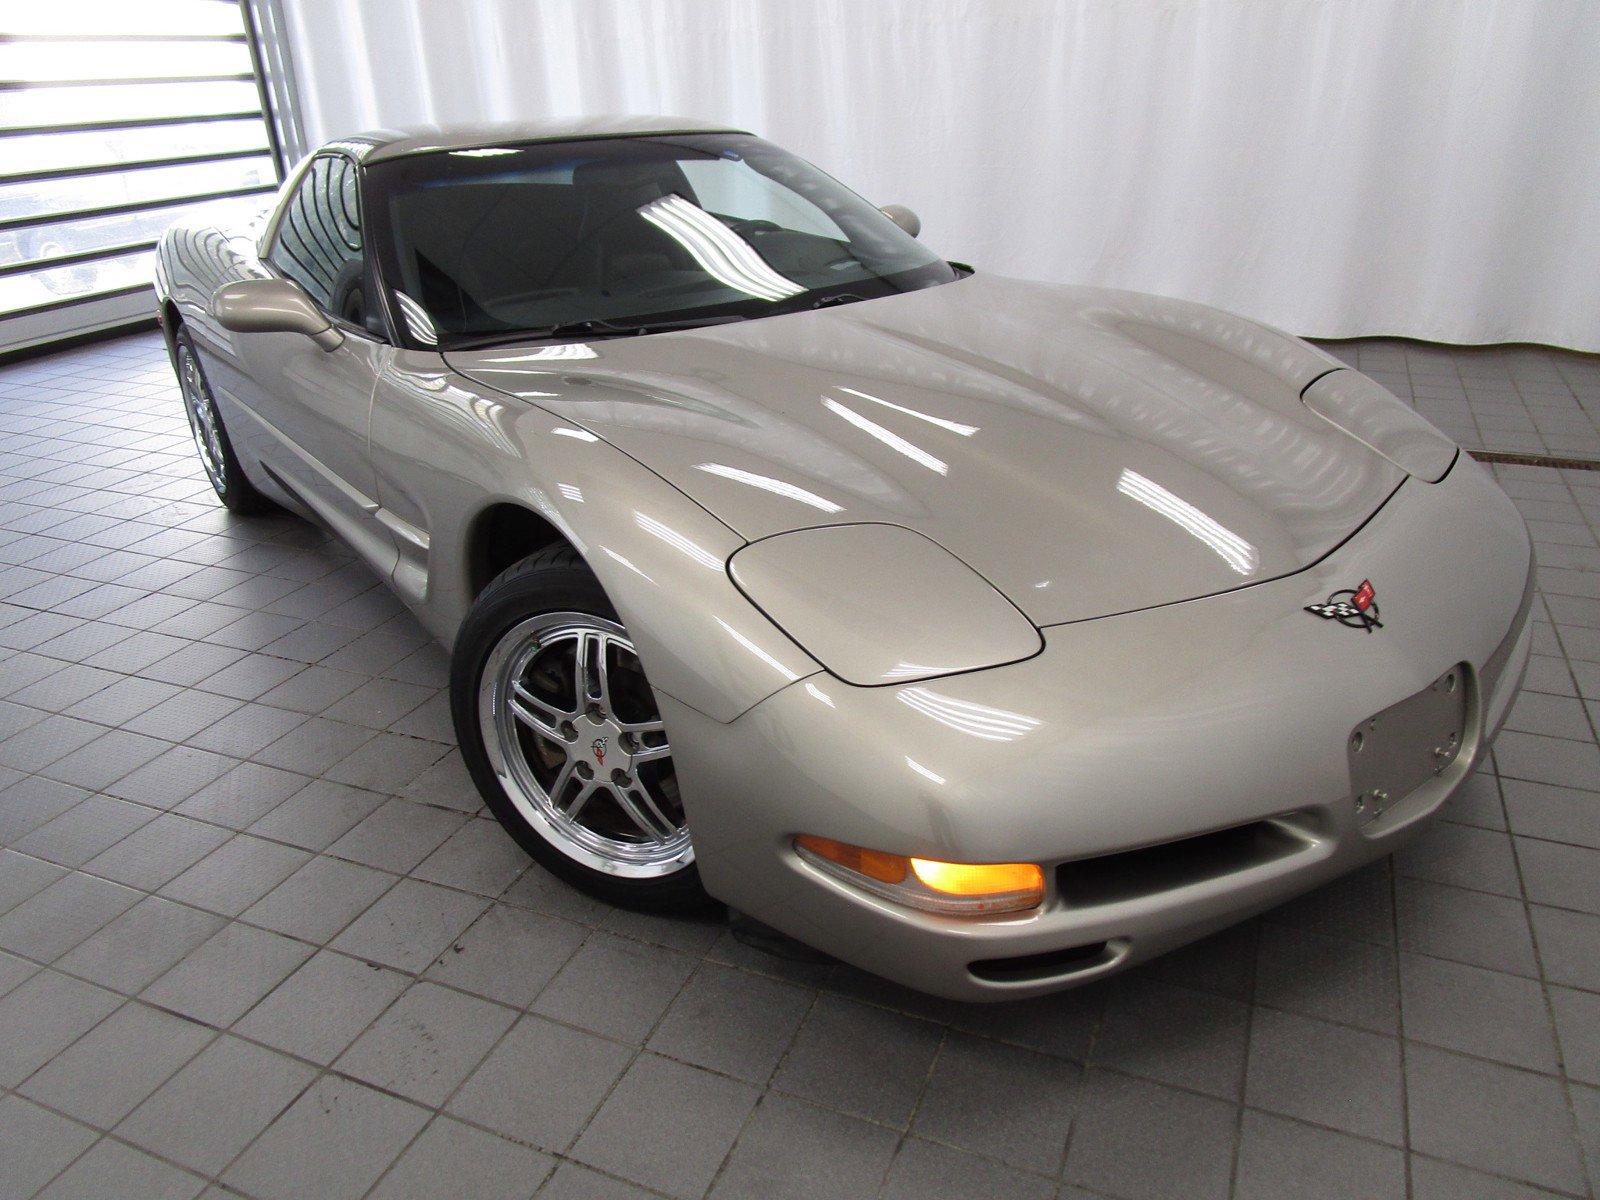 2001 Chevrolet Corvette 2dr Cpe